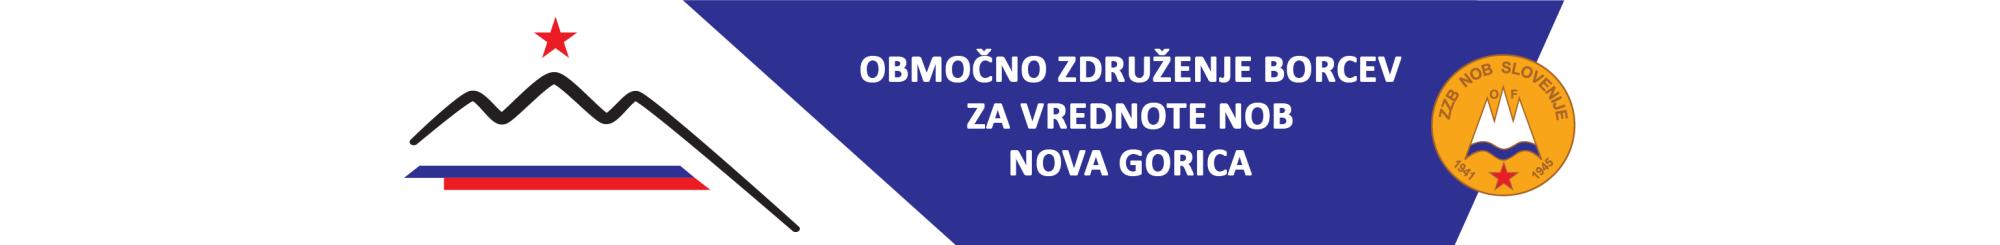 Zveza Borcev Nova Gorica